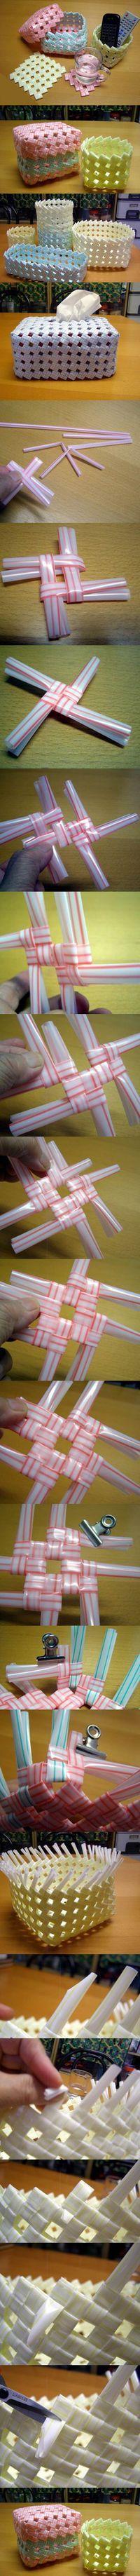 DIY Woven Straw Storage Baskets | iCreativeIdeas.com Like Us on Facebook ==> https://www.facebook.com/icreativeideas